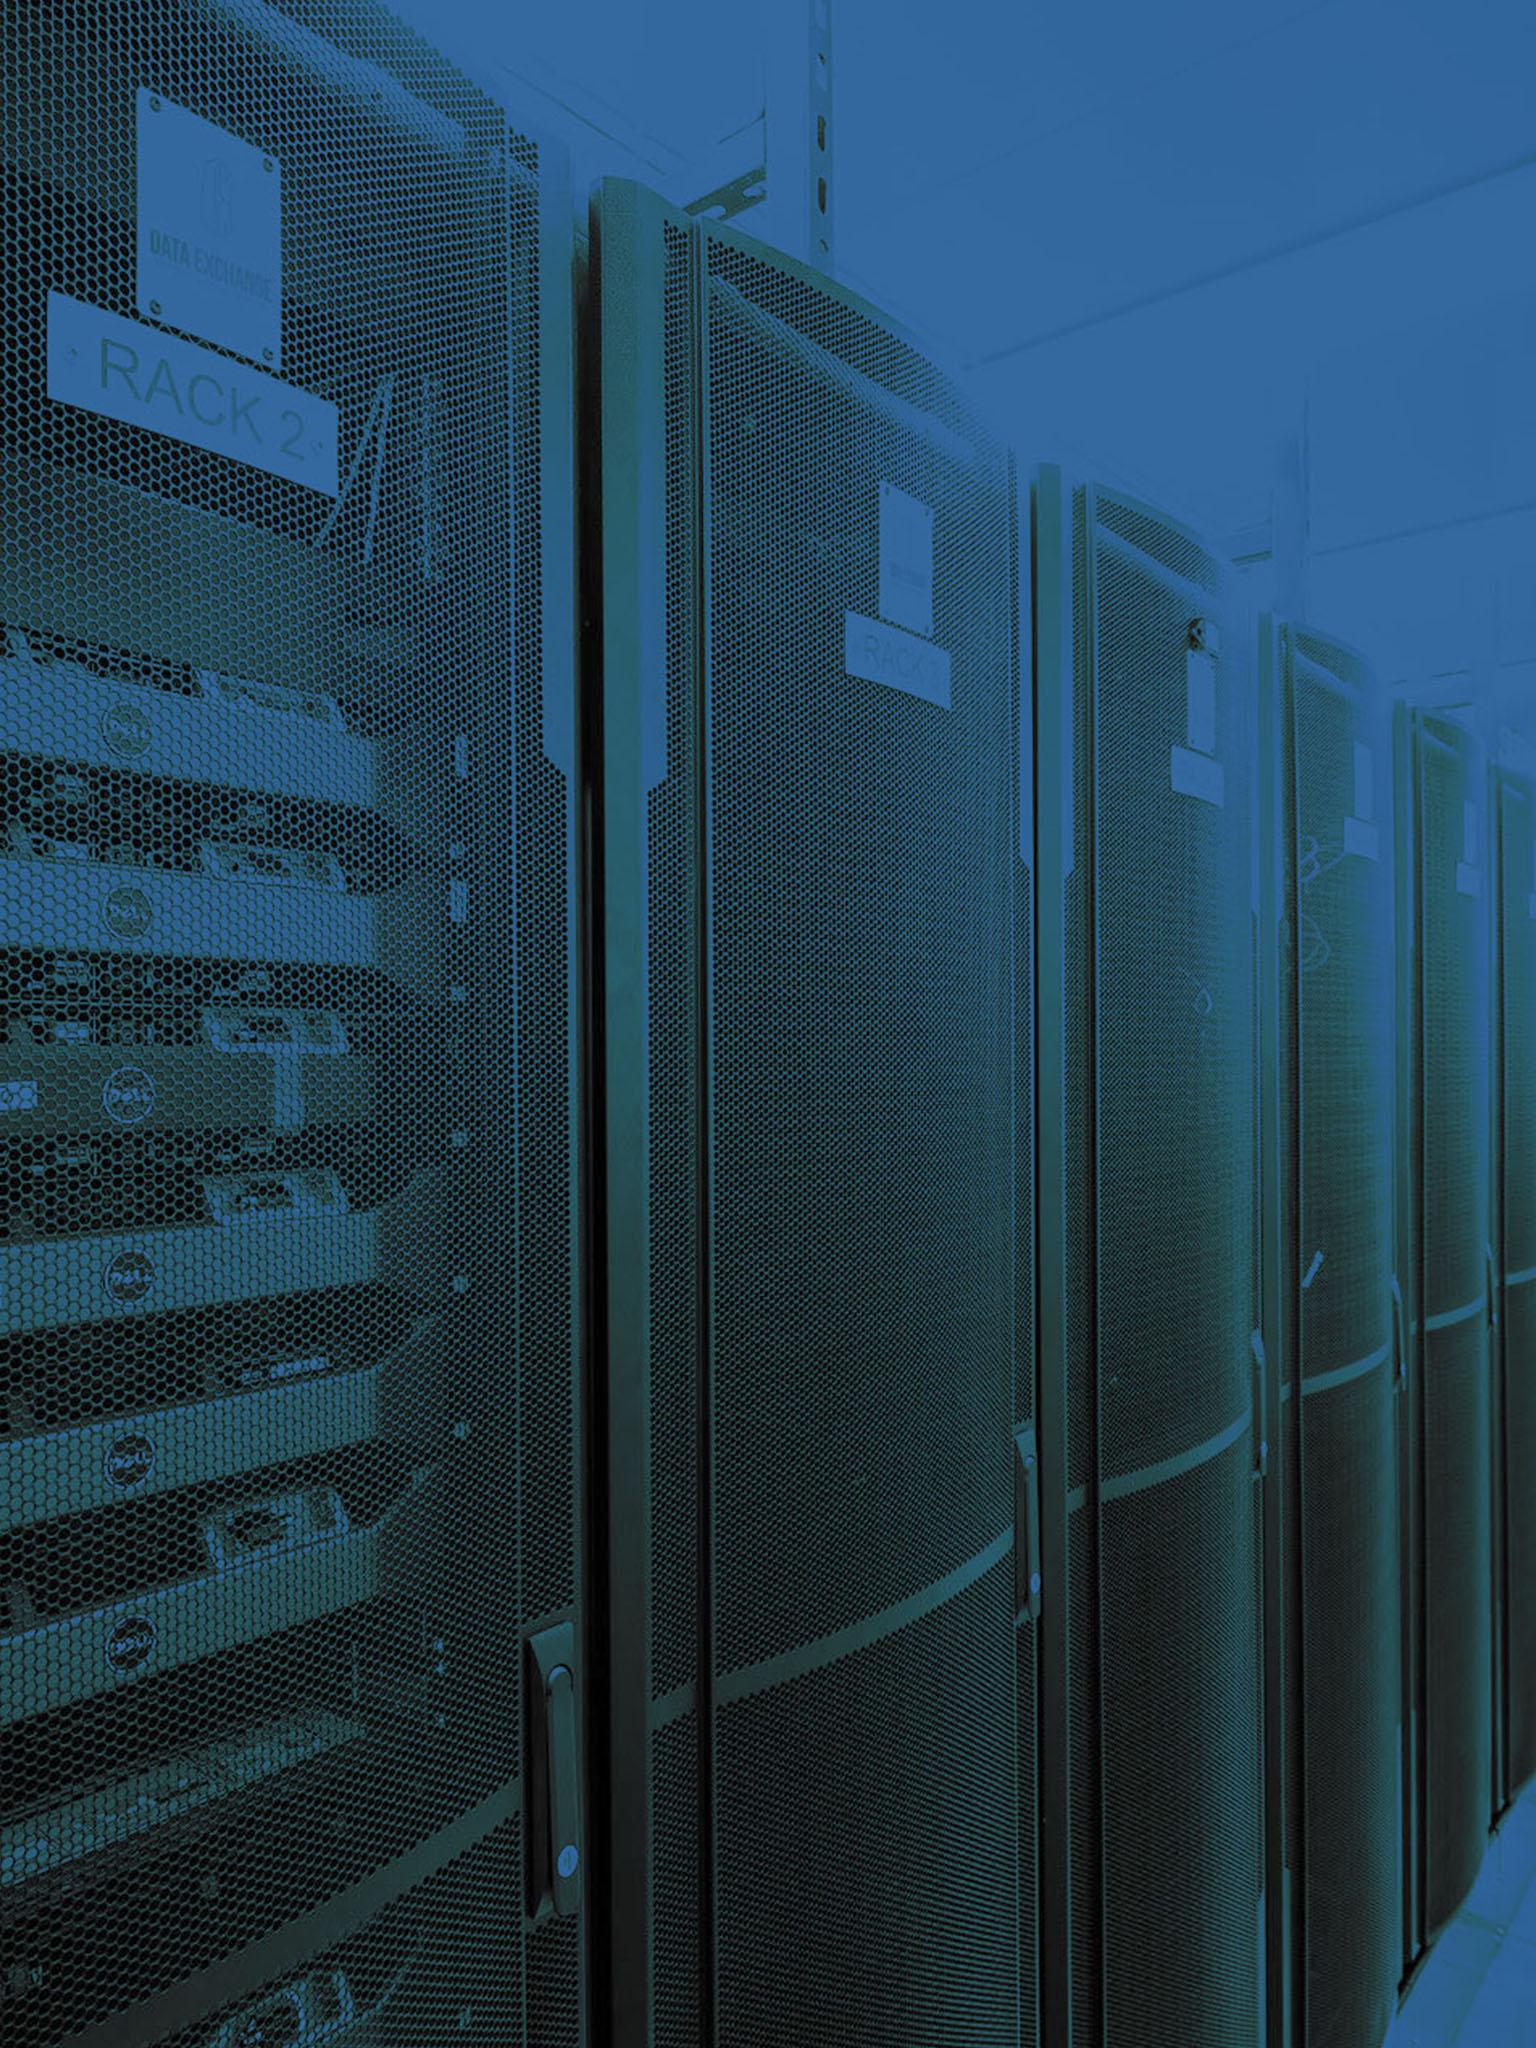 UDA cloud services construction project management software